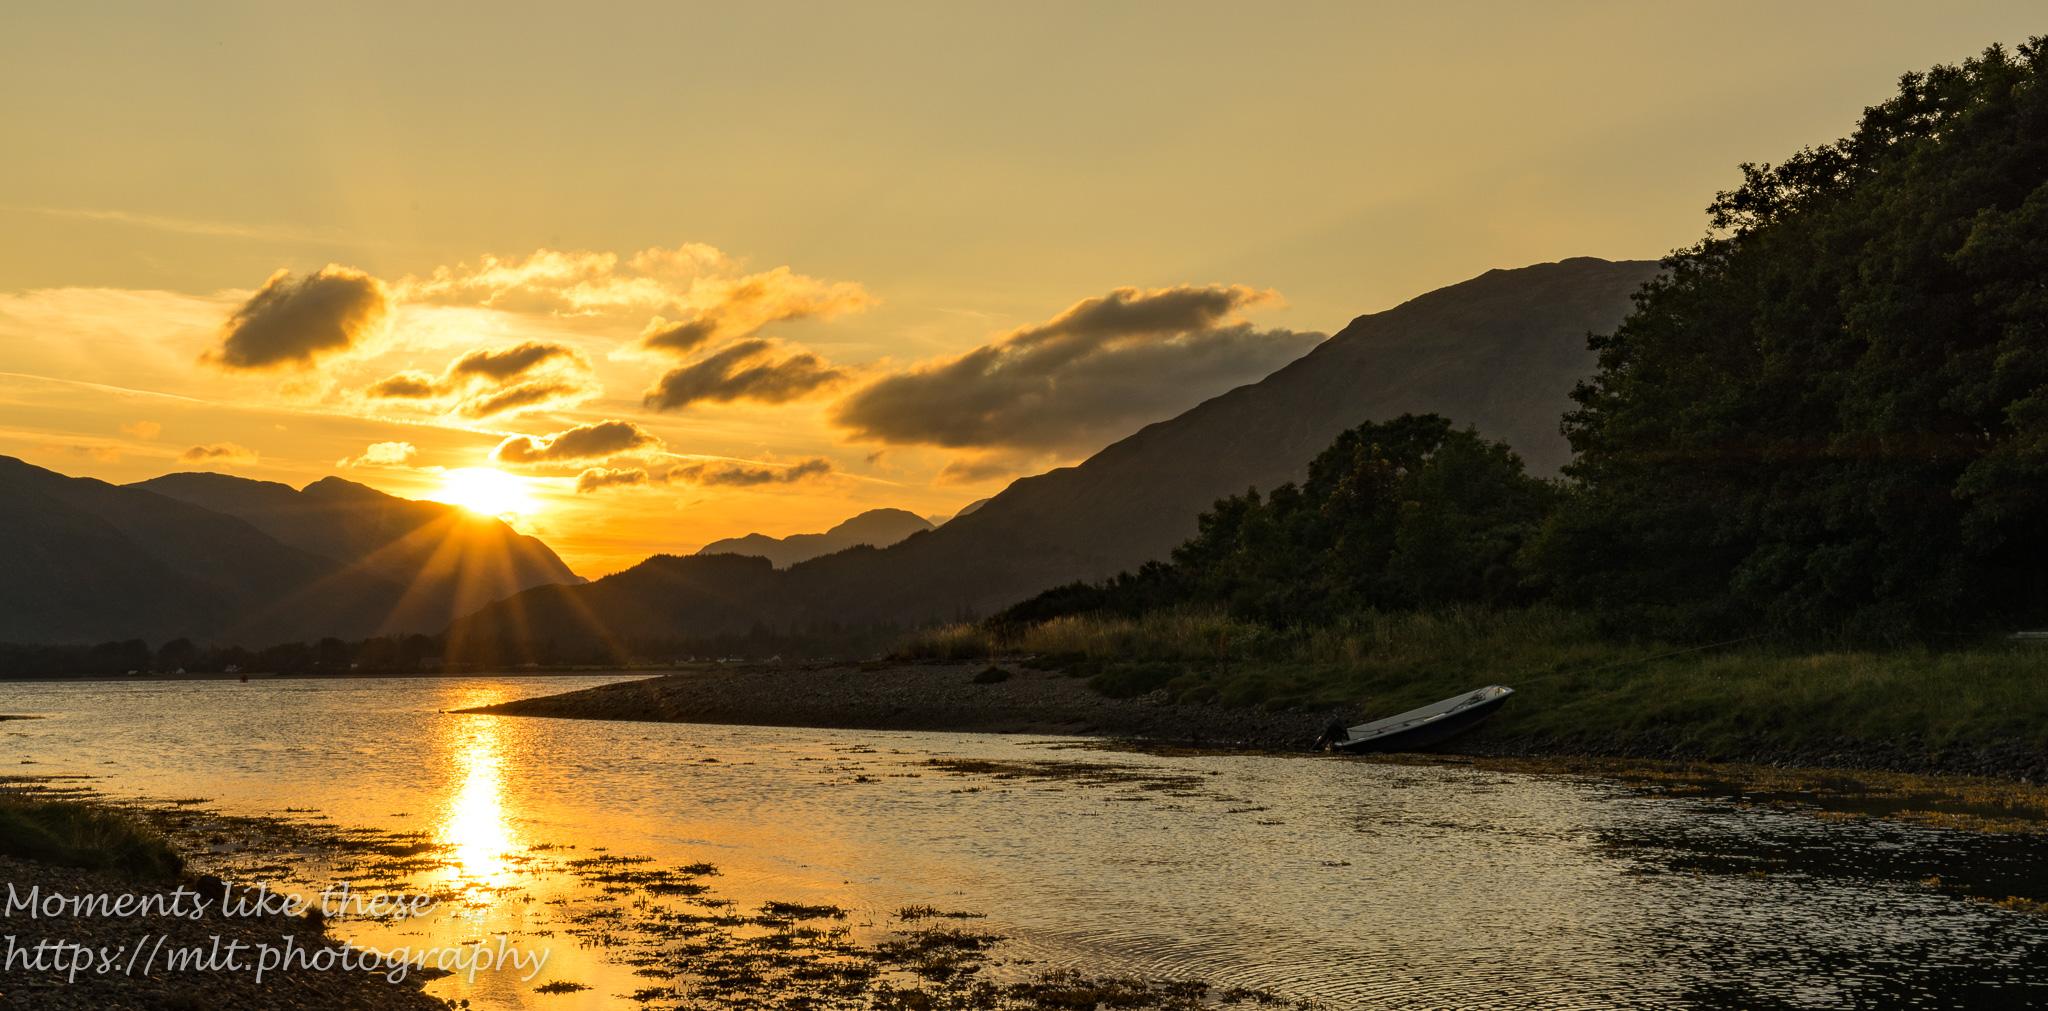 Sunset over Loch Linnhie